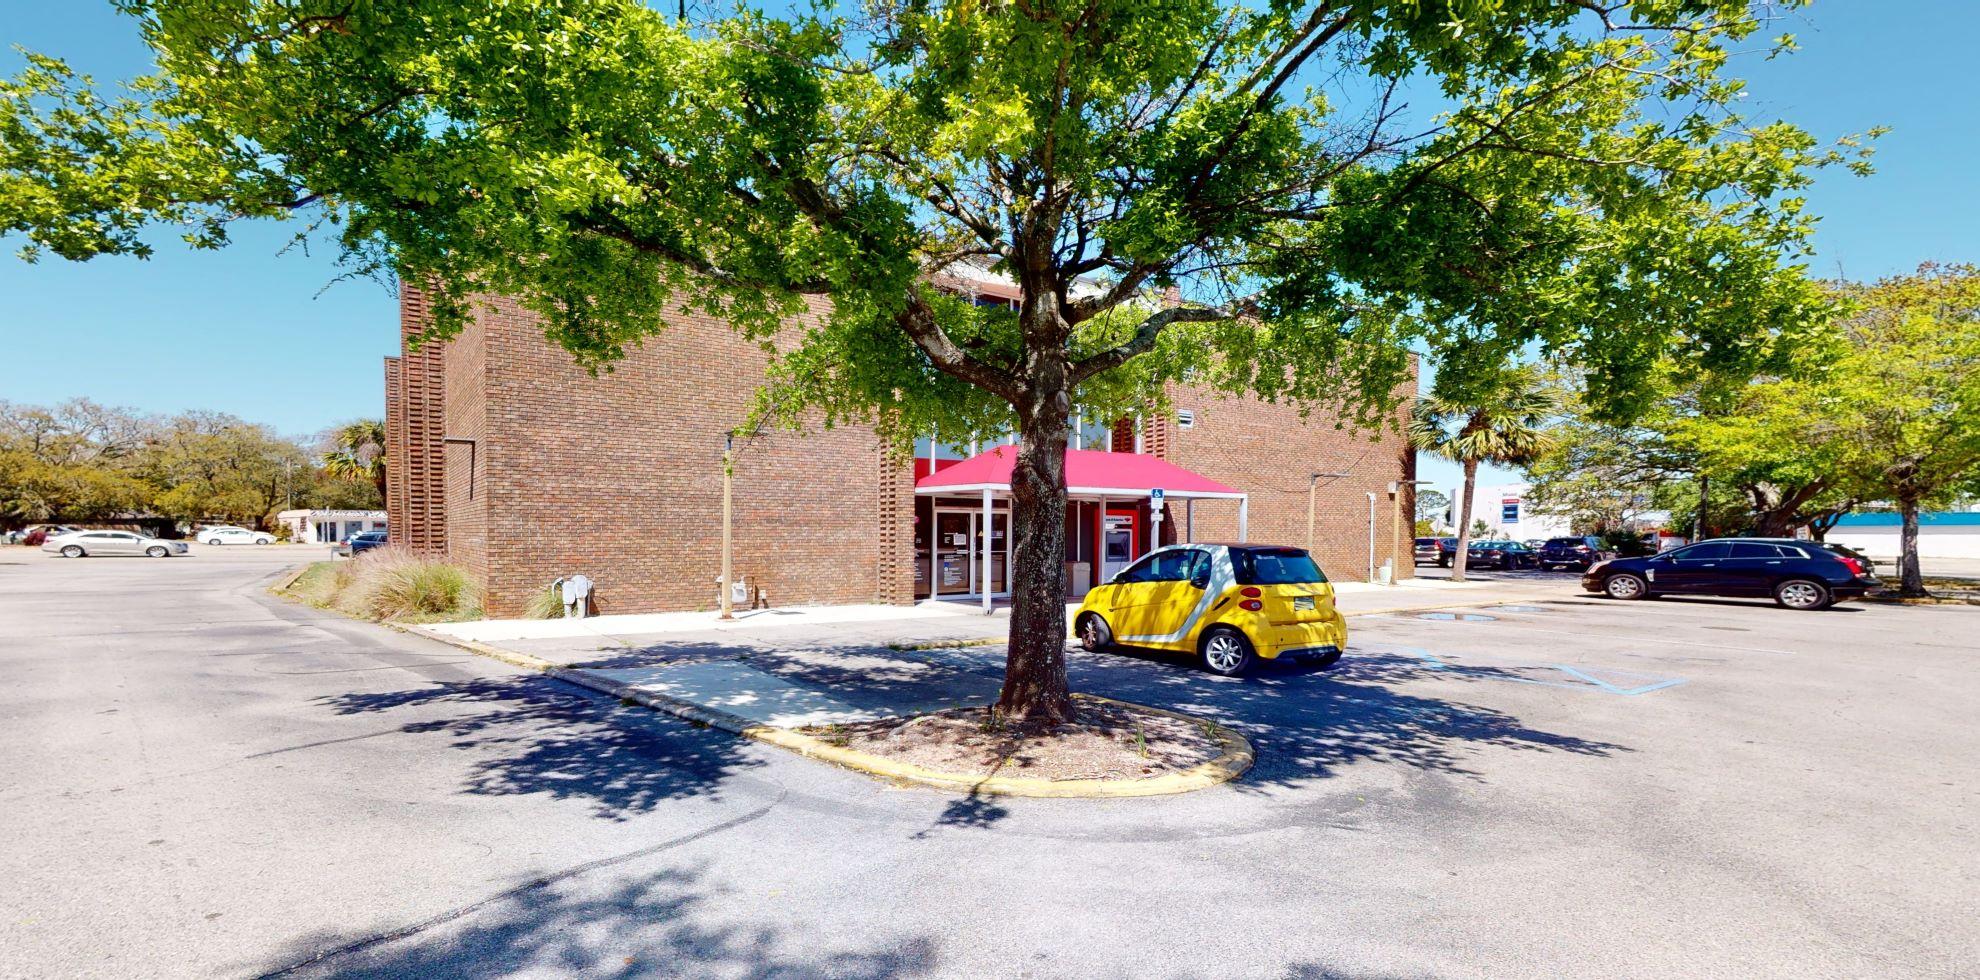 Bank of America financial center with drive-thru ATM   189 Eglin Pkwy NE, Ft Walton Beach, FL 32548